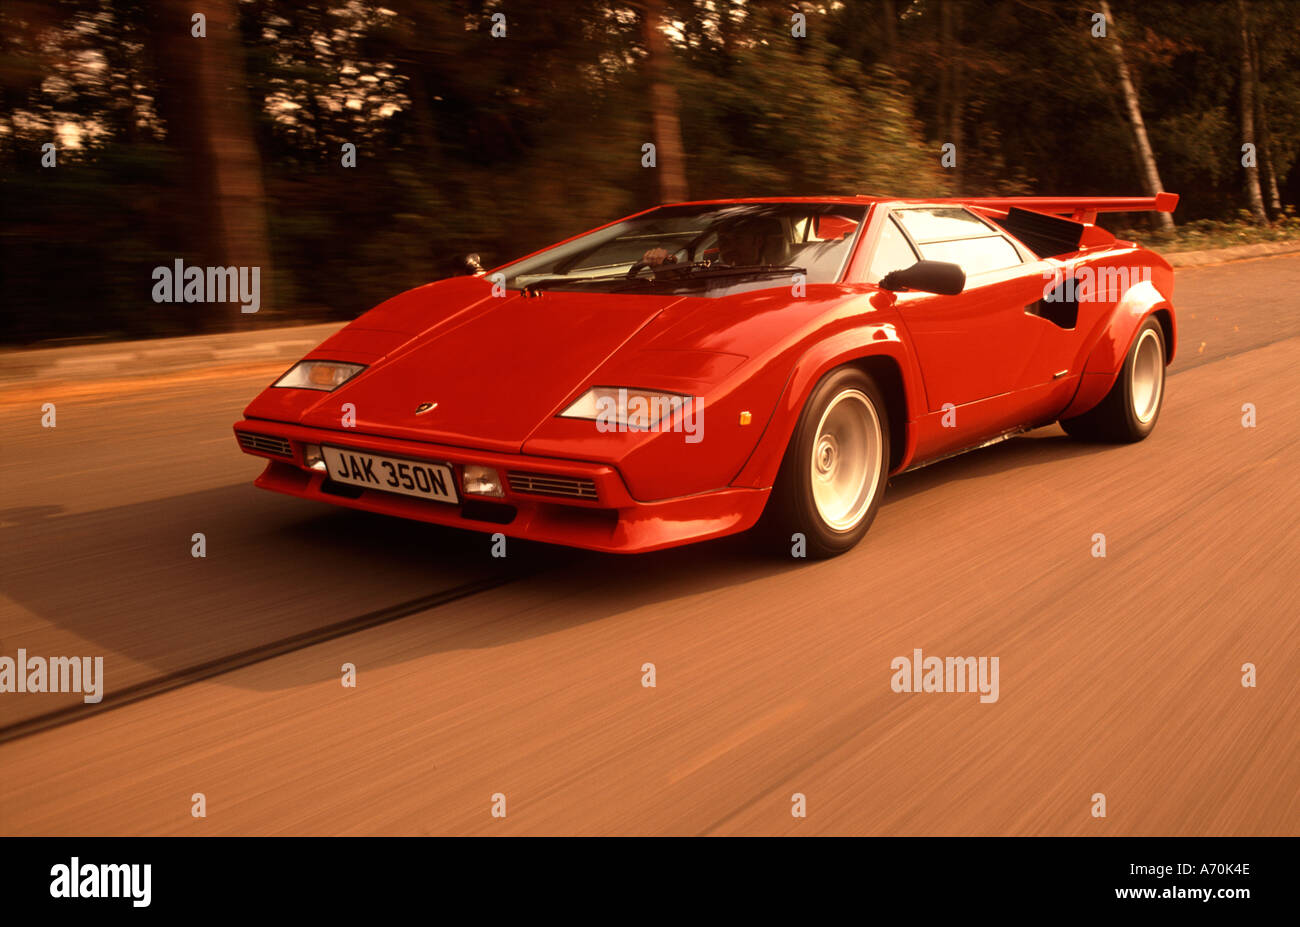 Lamborghini Countach - Stock Image